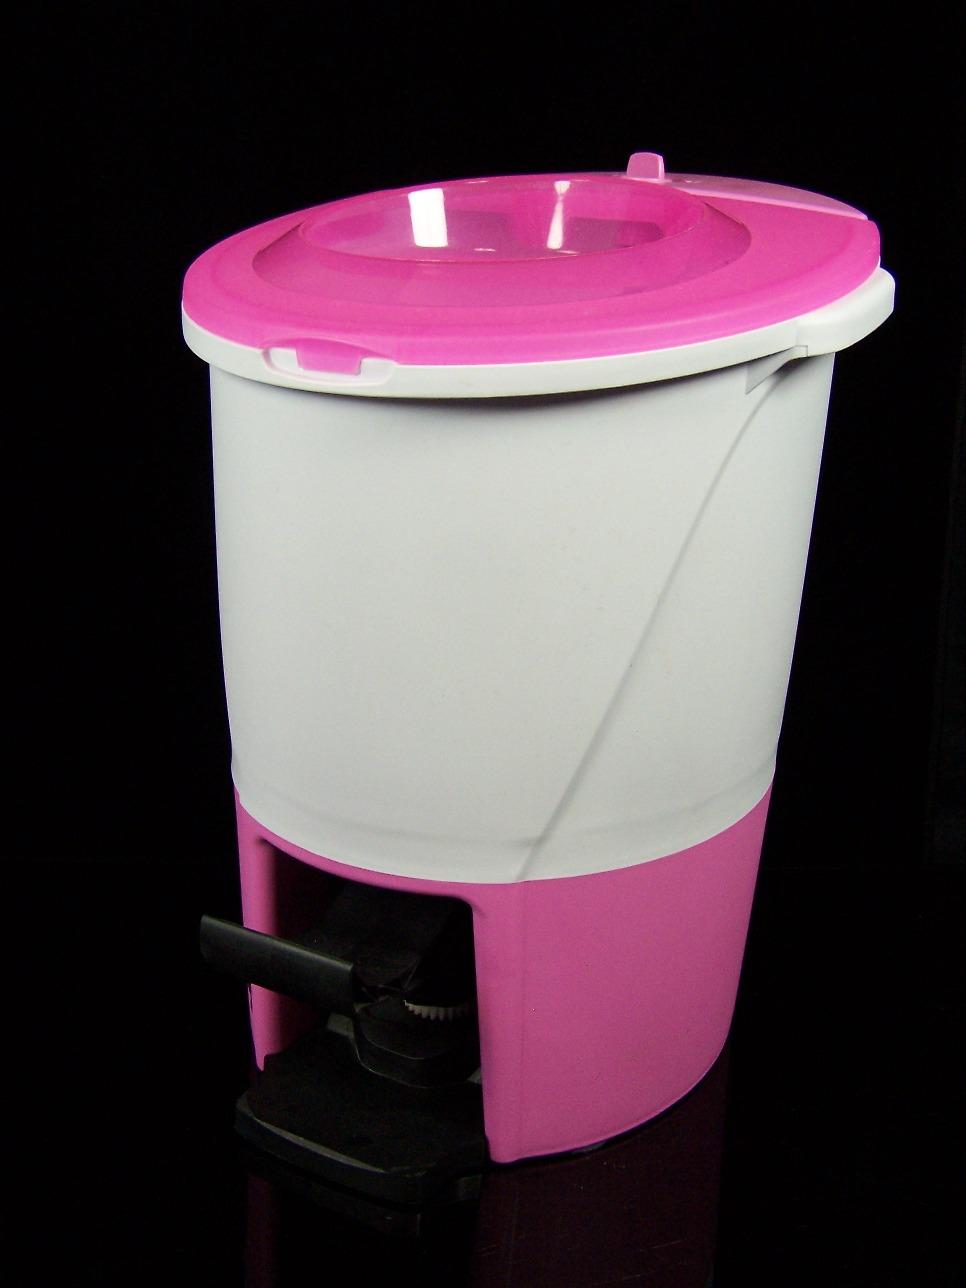 twister jh 0202 manuelle mini waschmaschine. Black Bedroom Furniture Sets. Home Design Ideas